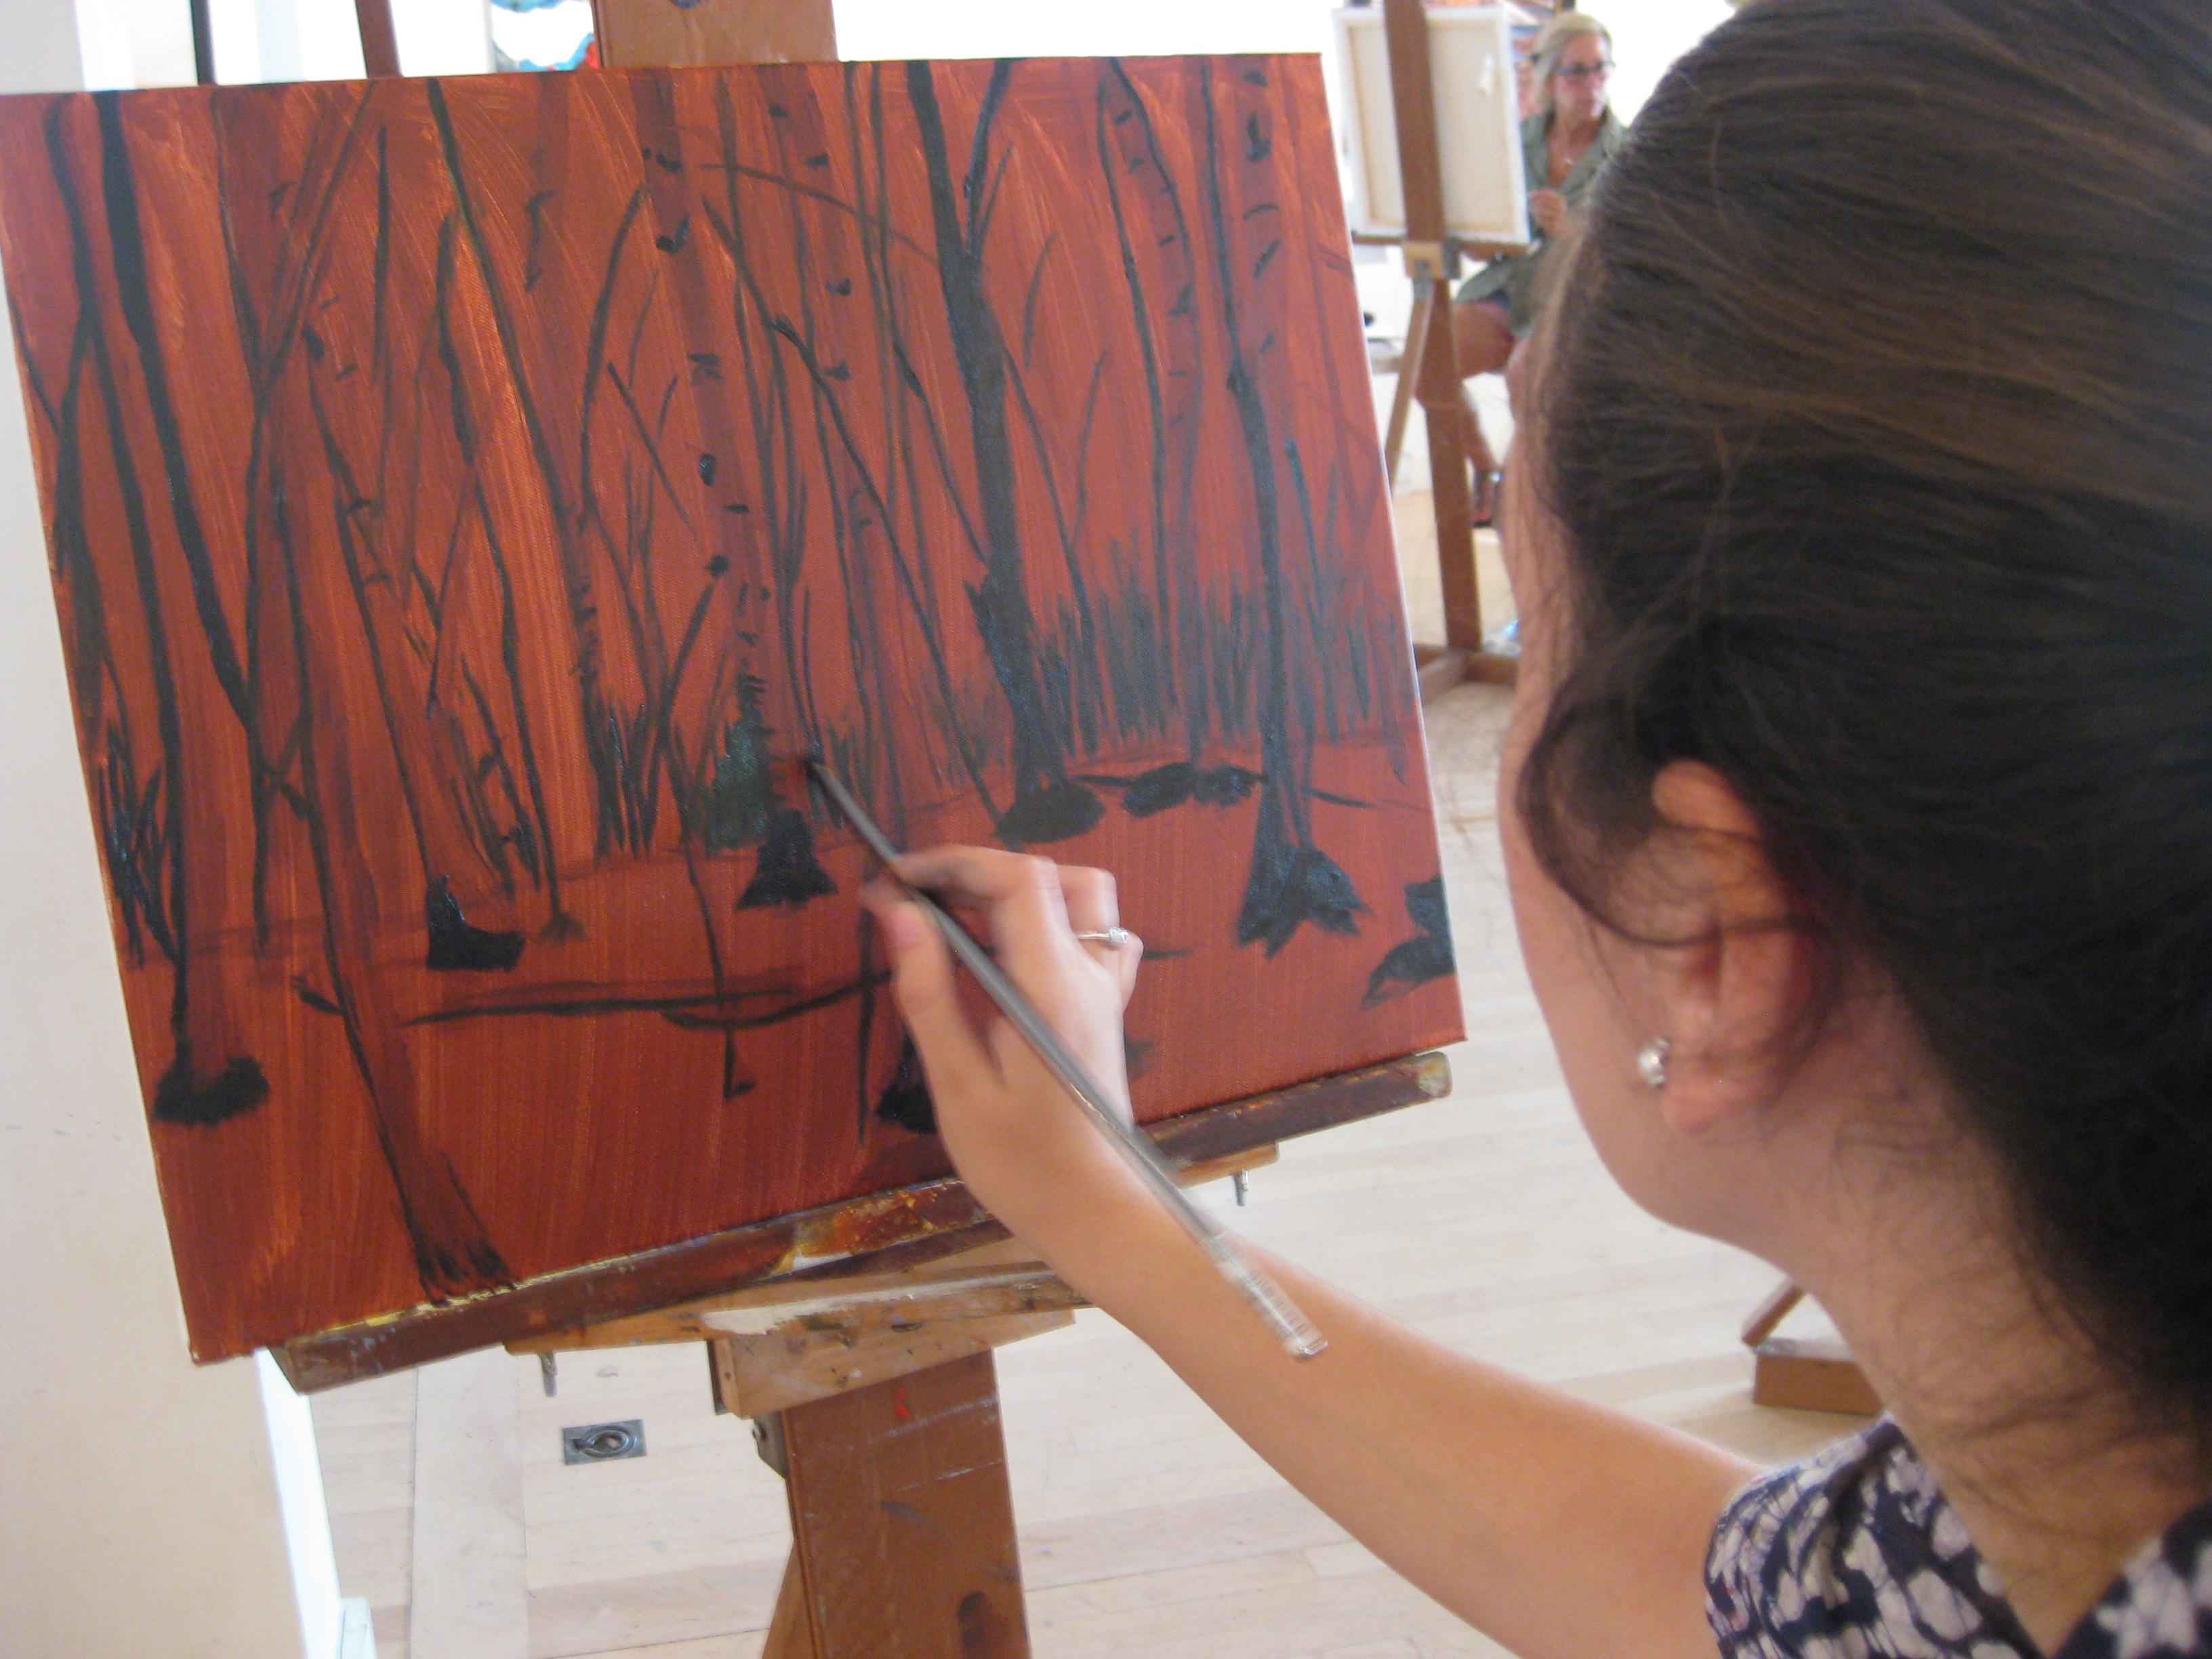 David Kelavey Art Course